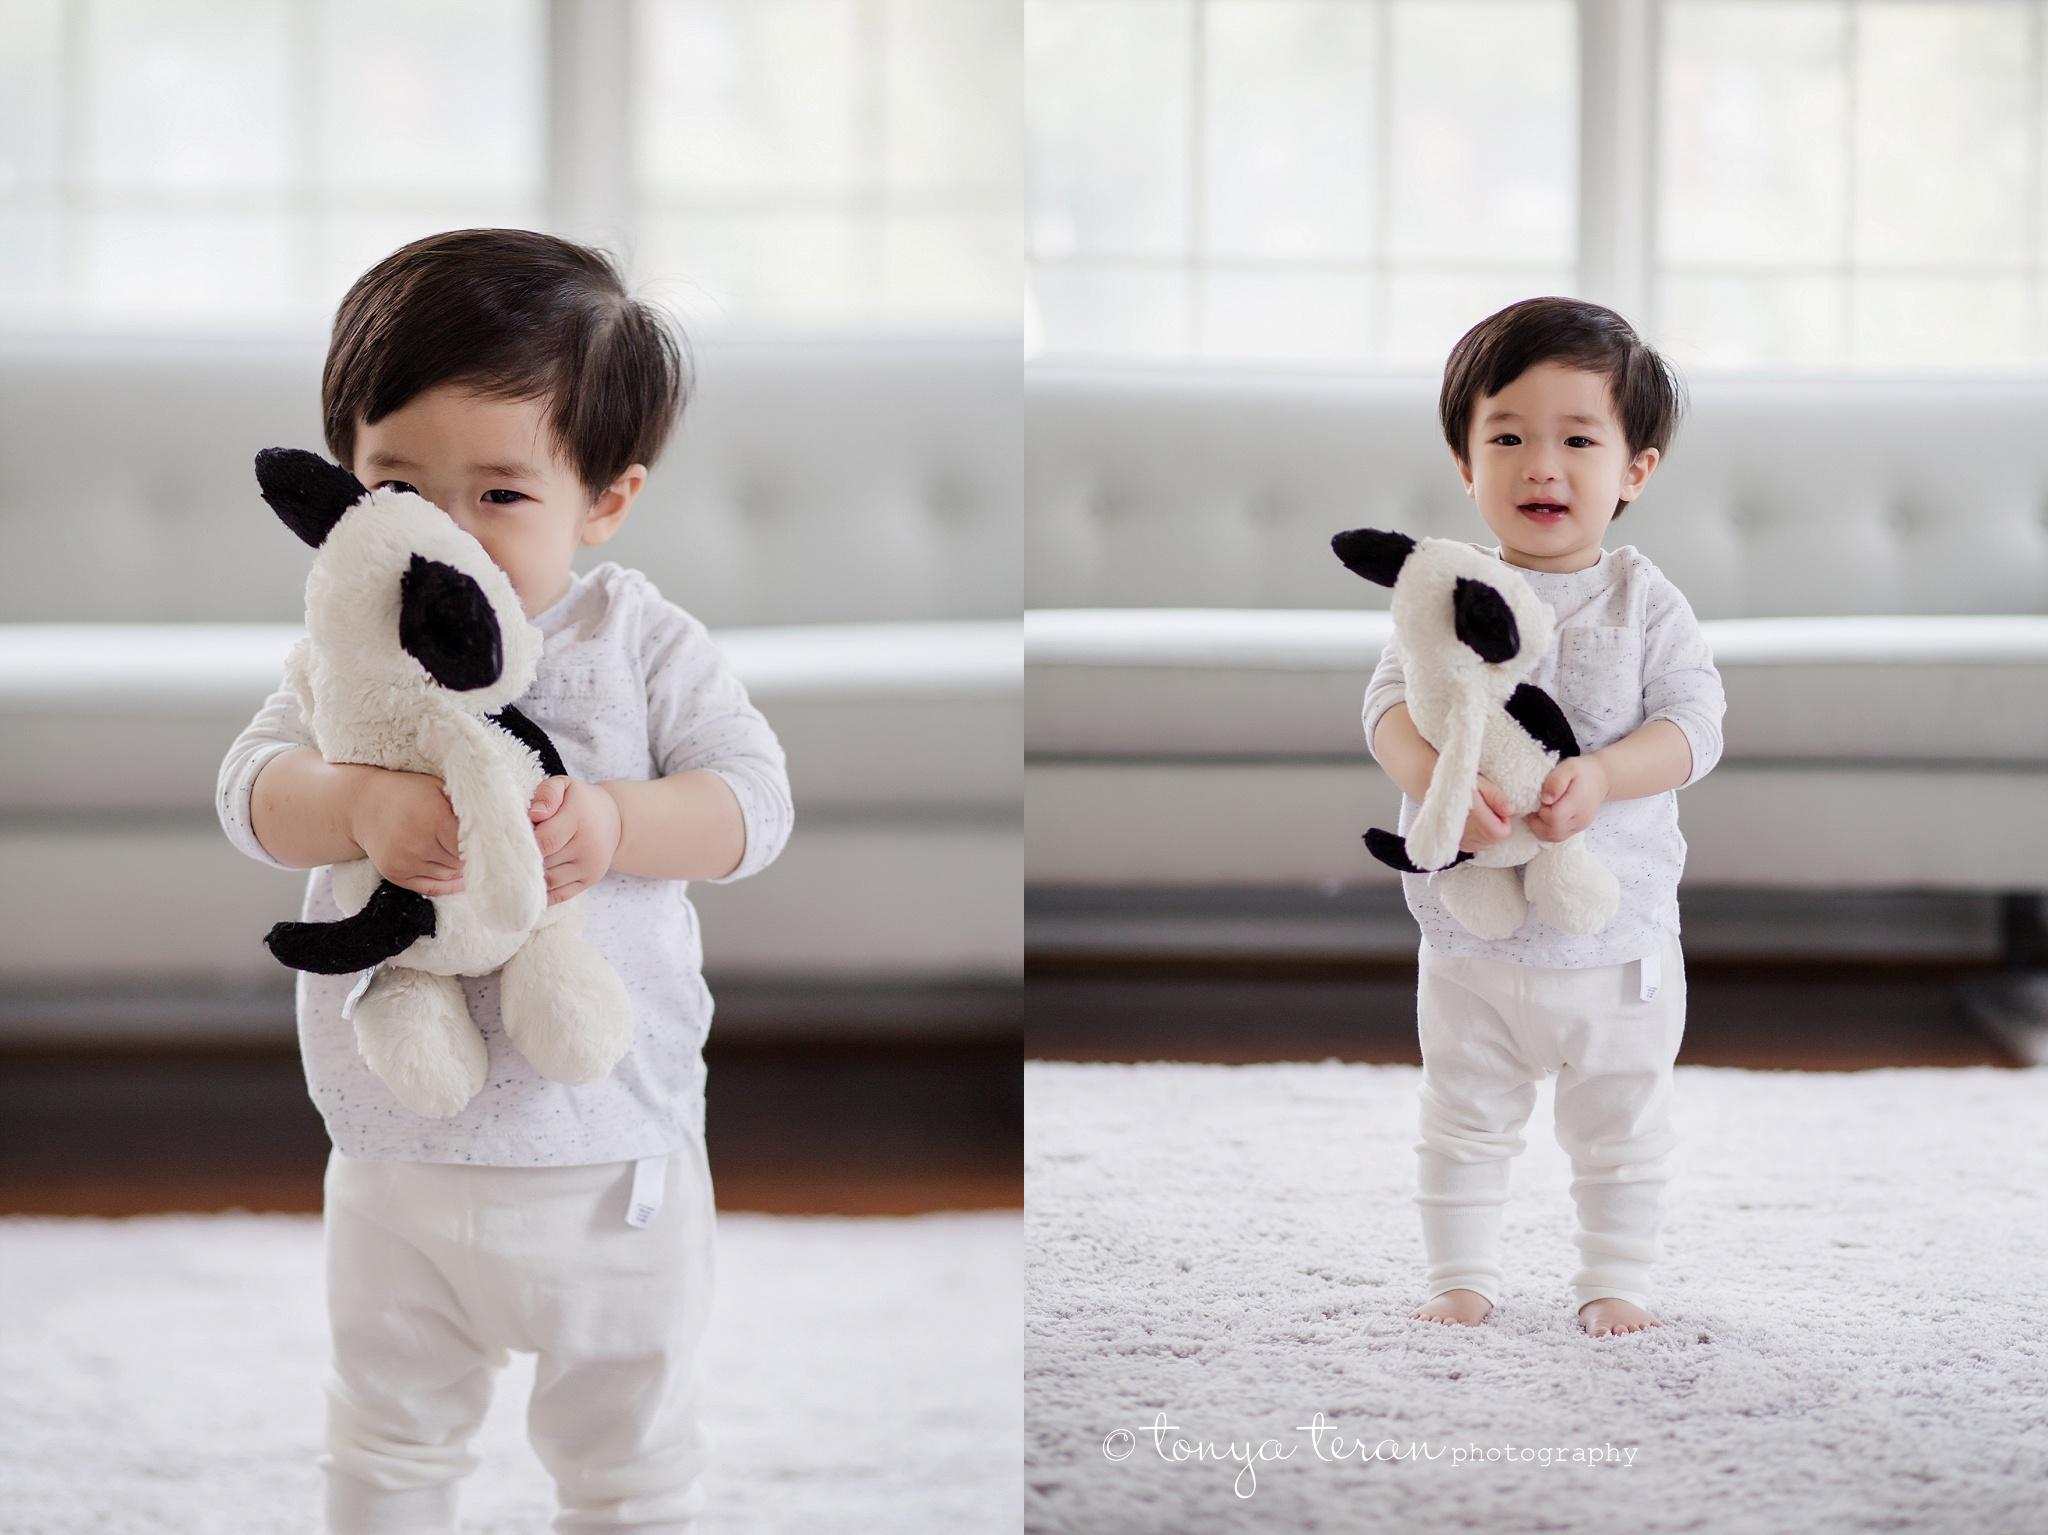 In-home Mini Family Photo Session | Tonya Teran Photography, McLean, VA #1 Best Newborn, Baby, and Family Photographer